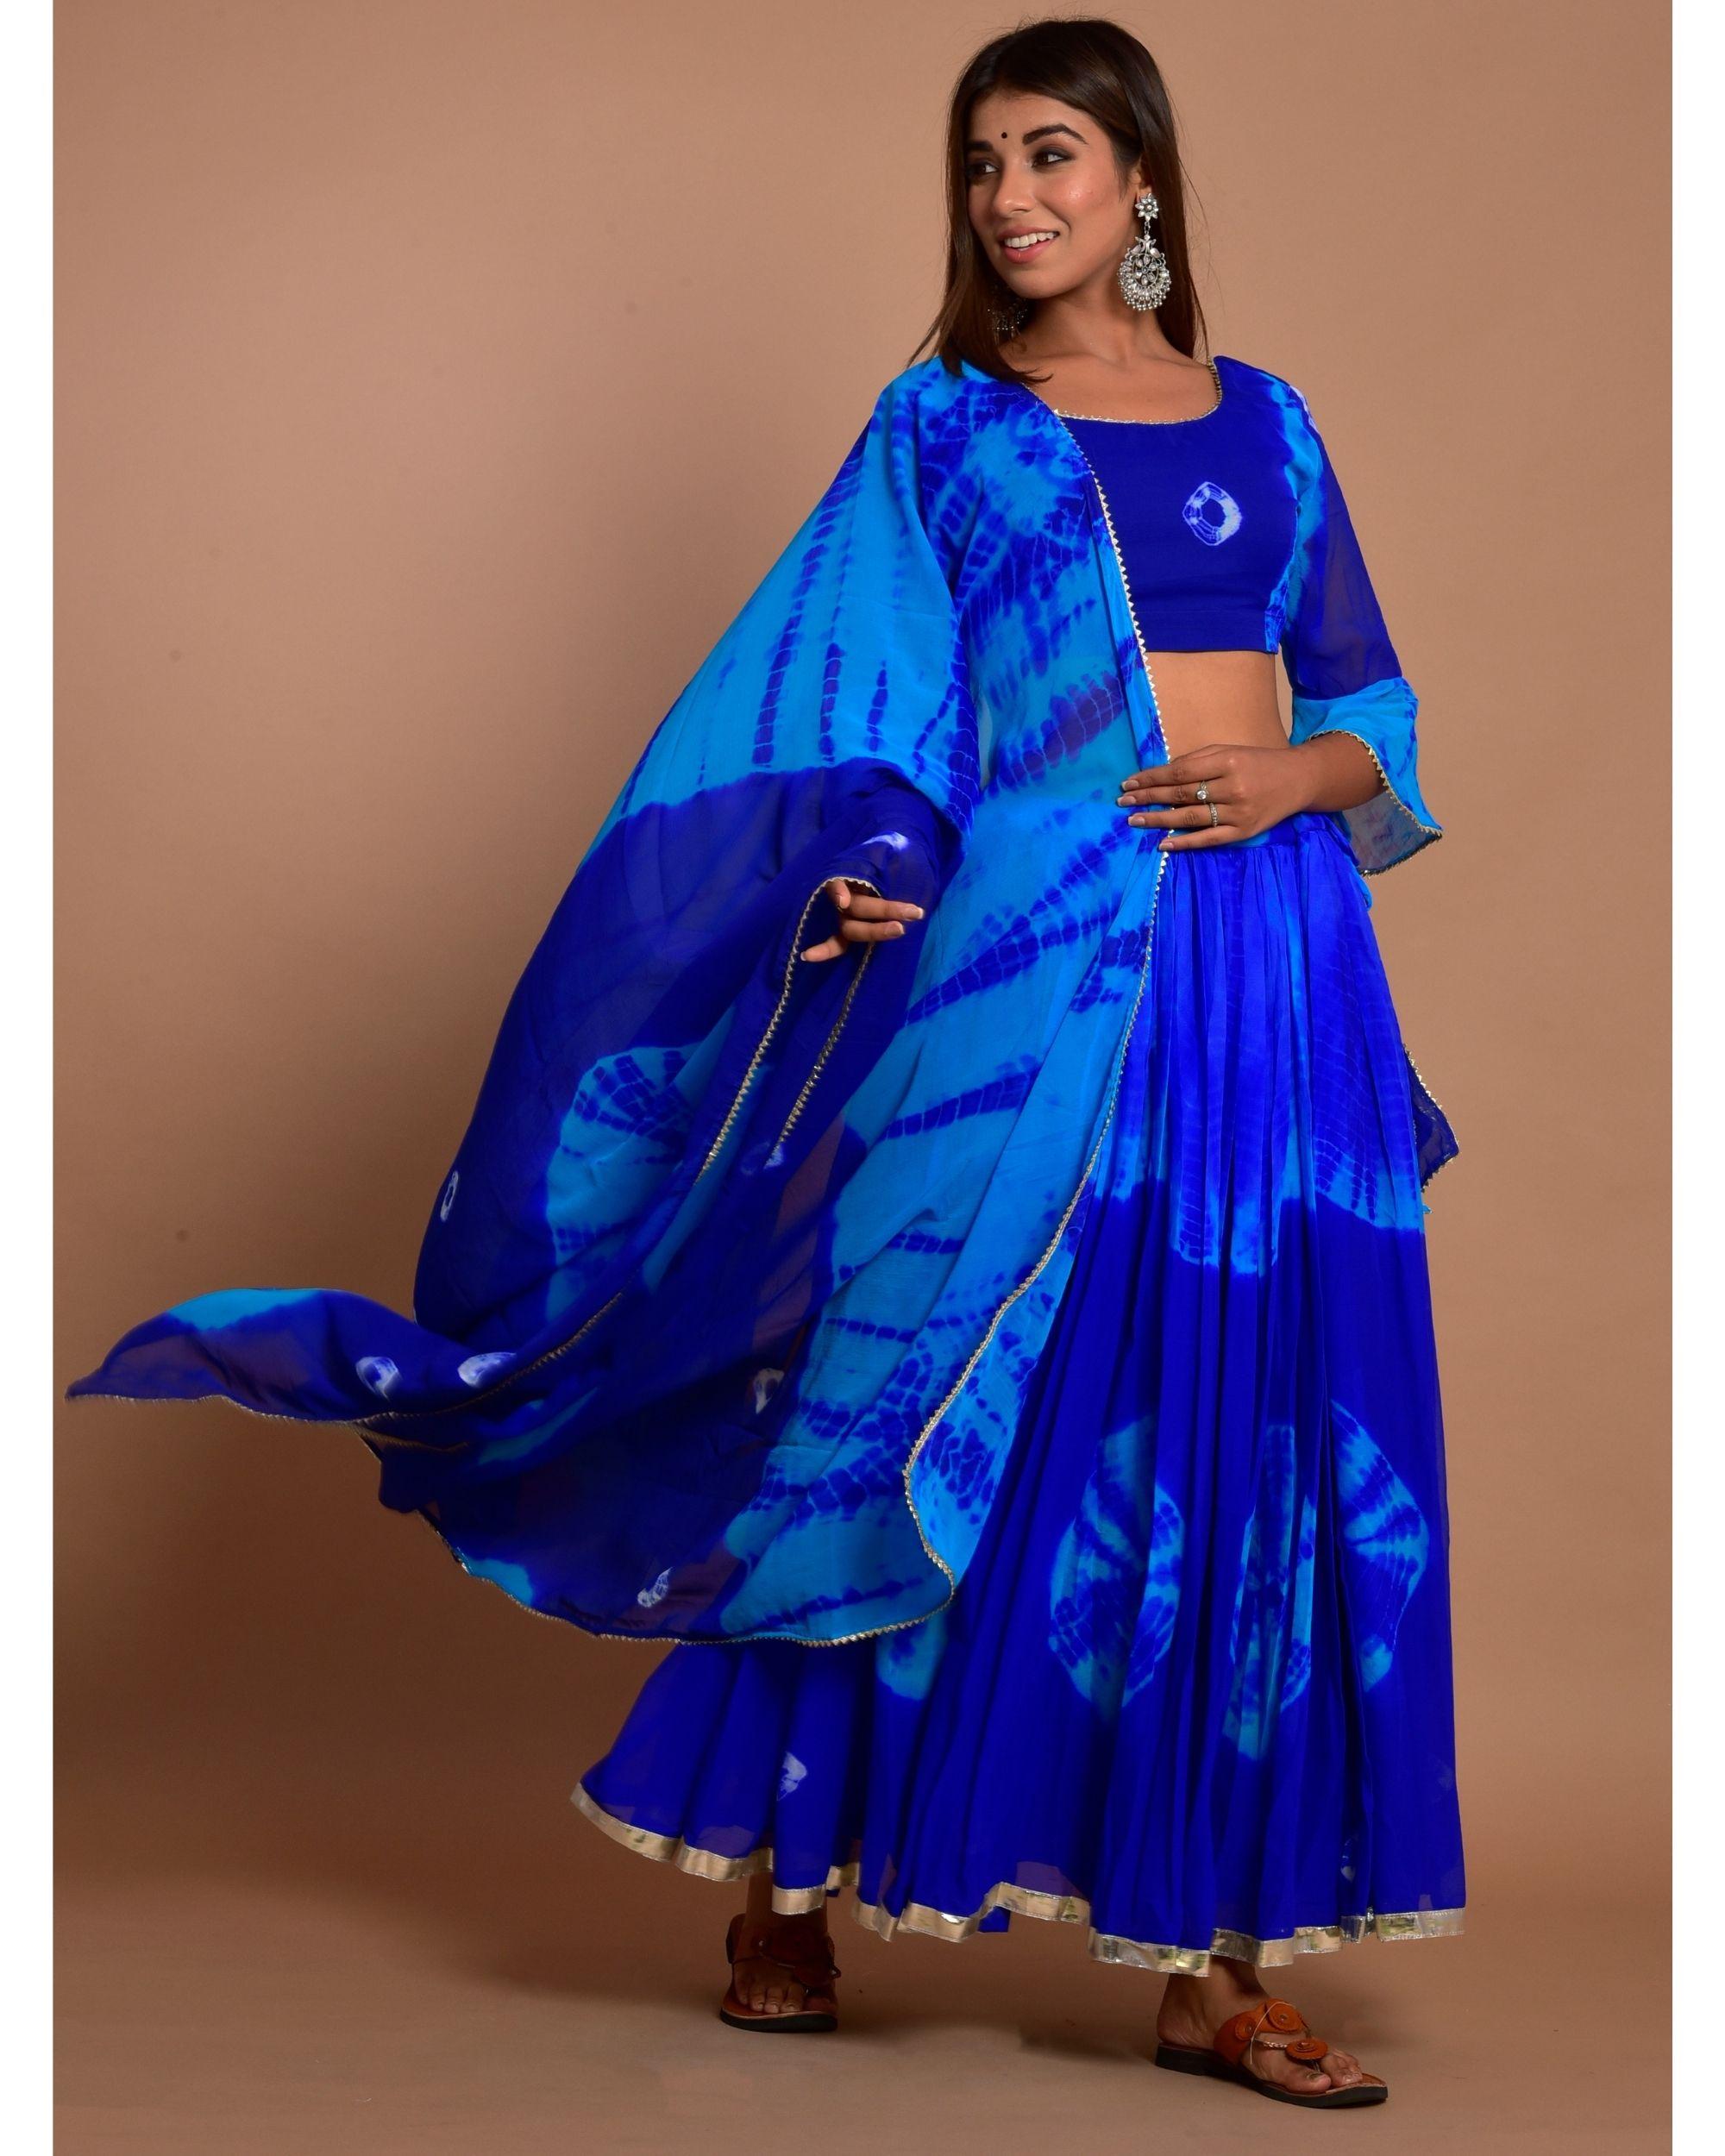 Blue tie and dye choli and gota lehenga with dupatta - Set Of Three